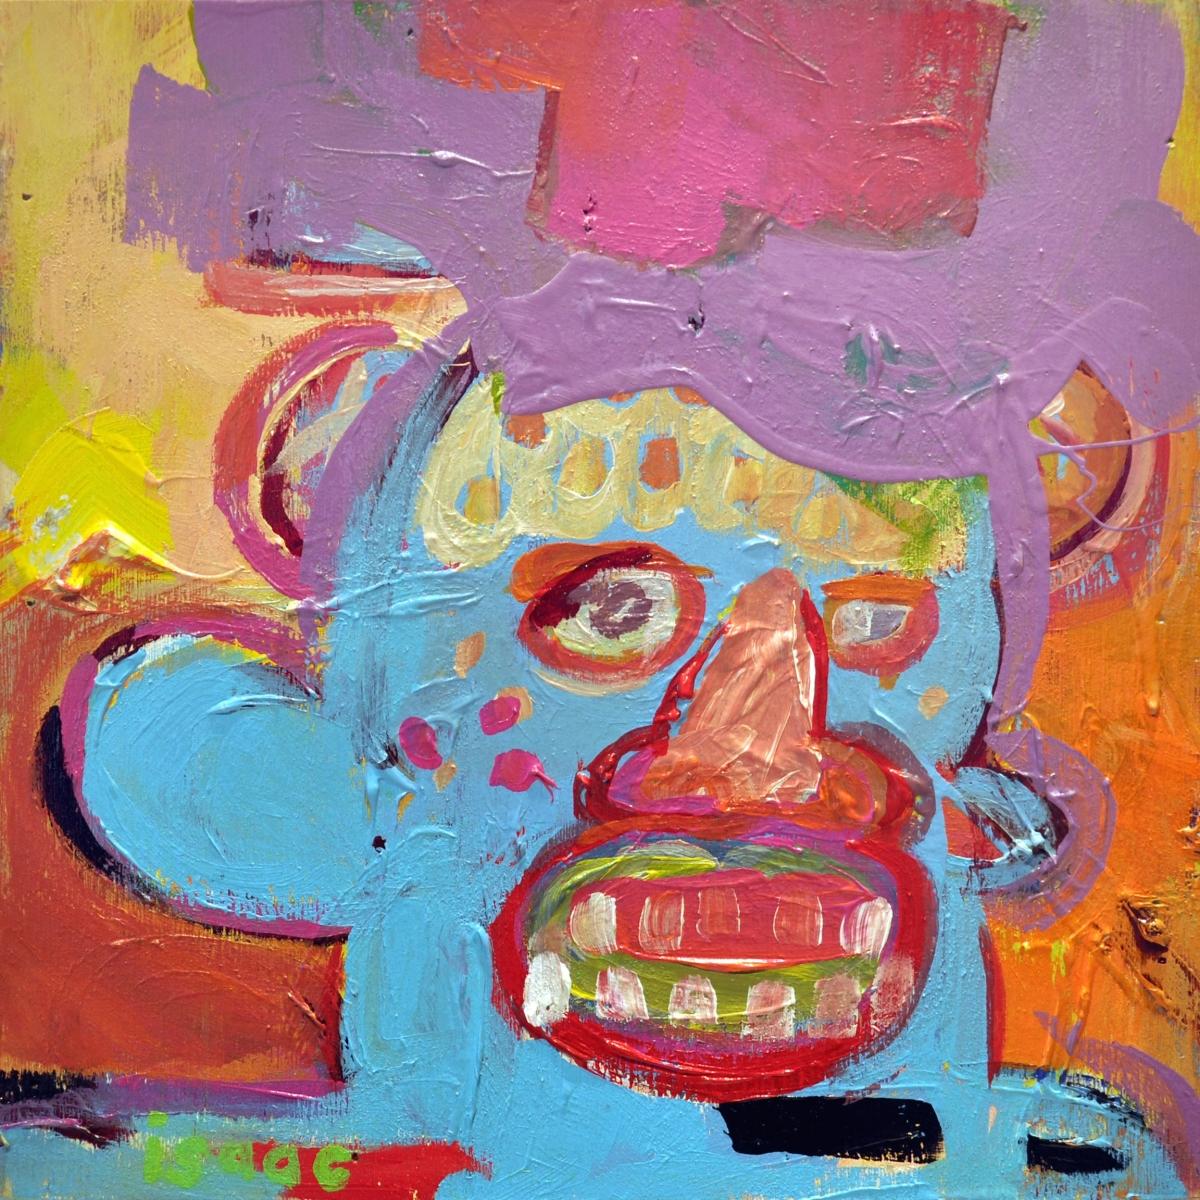 blue man's teeth (large view)